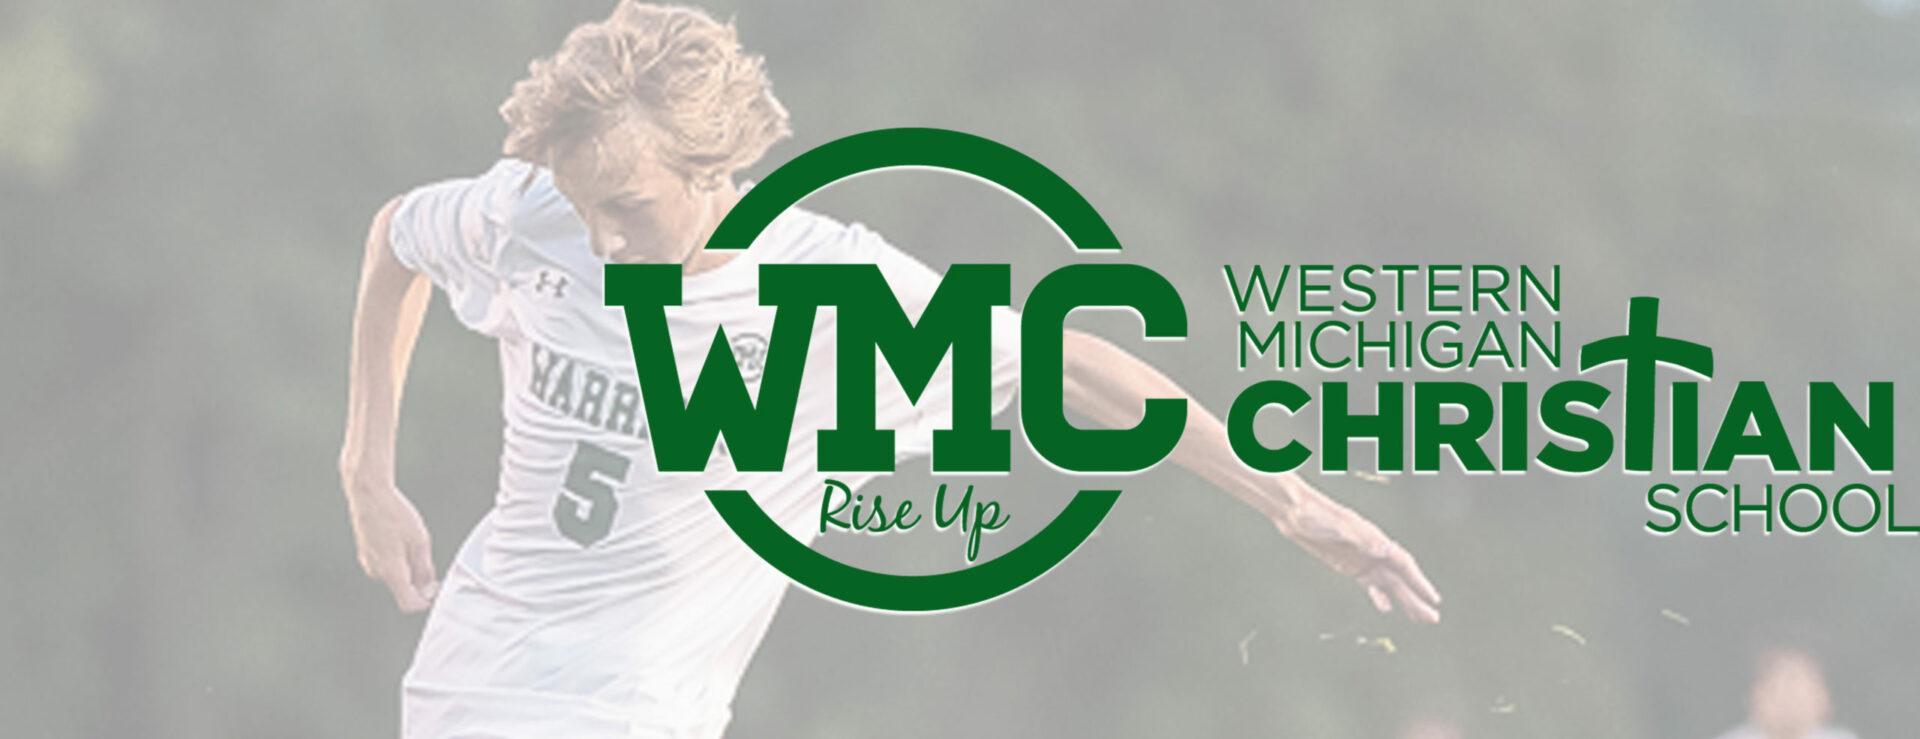 Western Michigan Christian dedication ceremony for new athletic facility Saturday, invites public